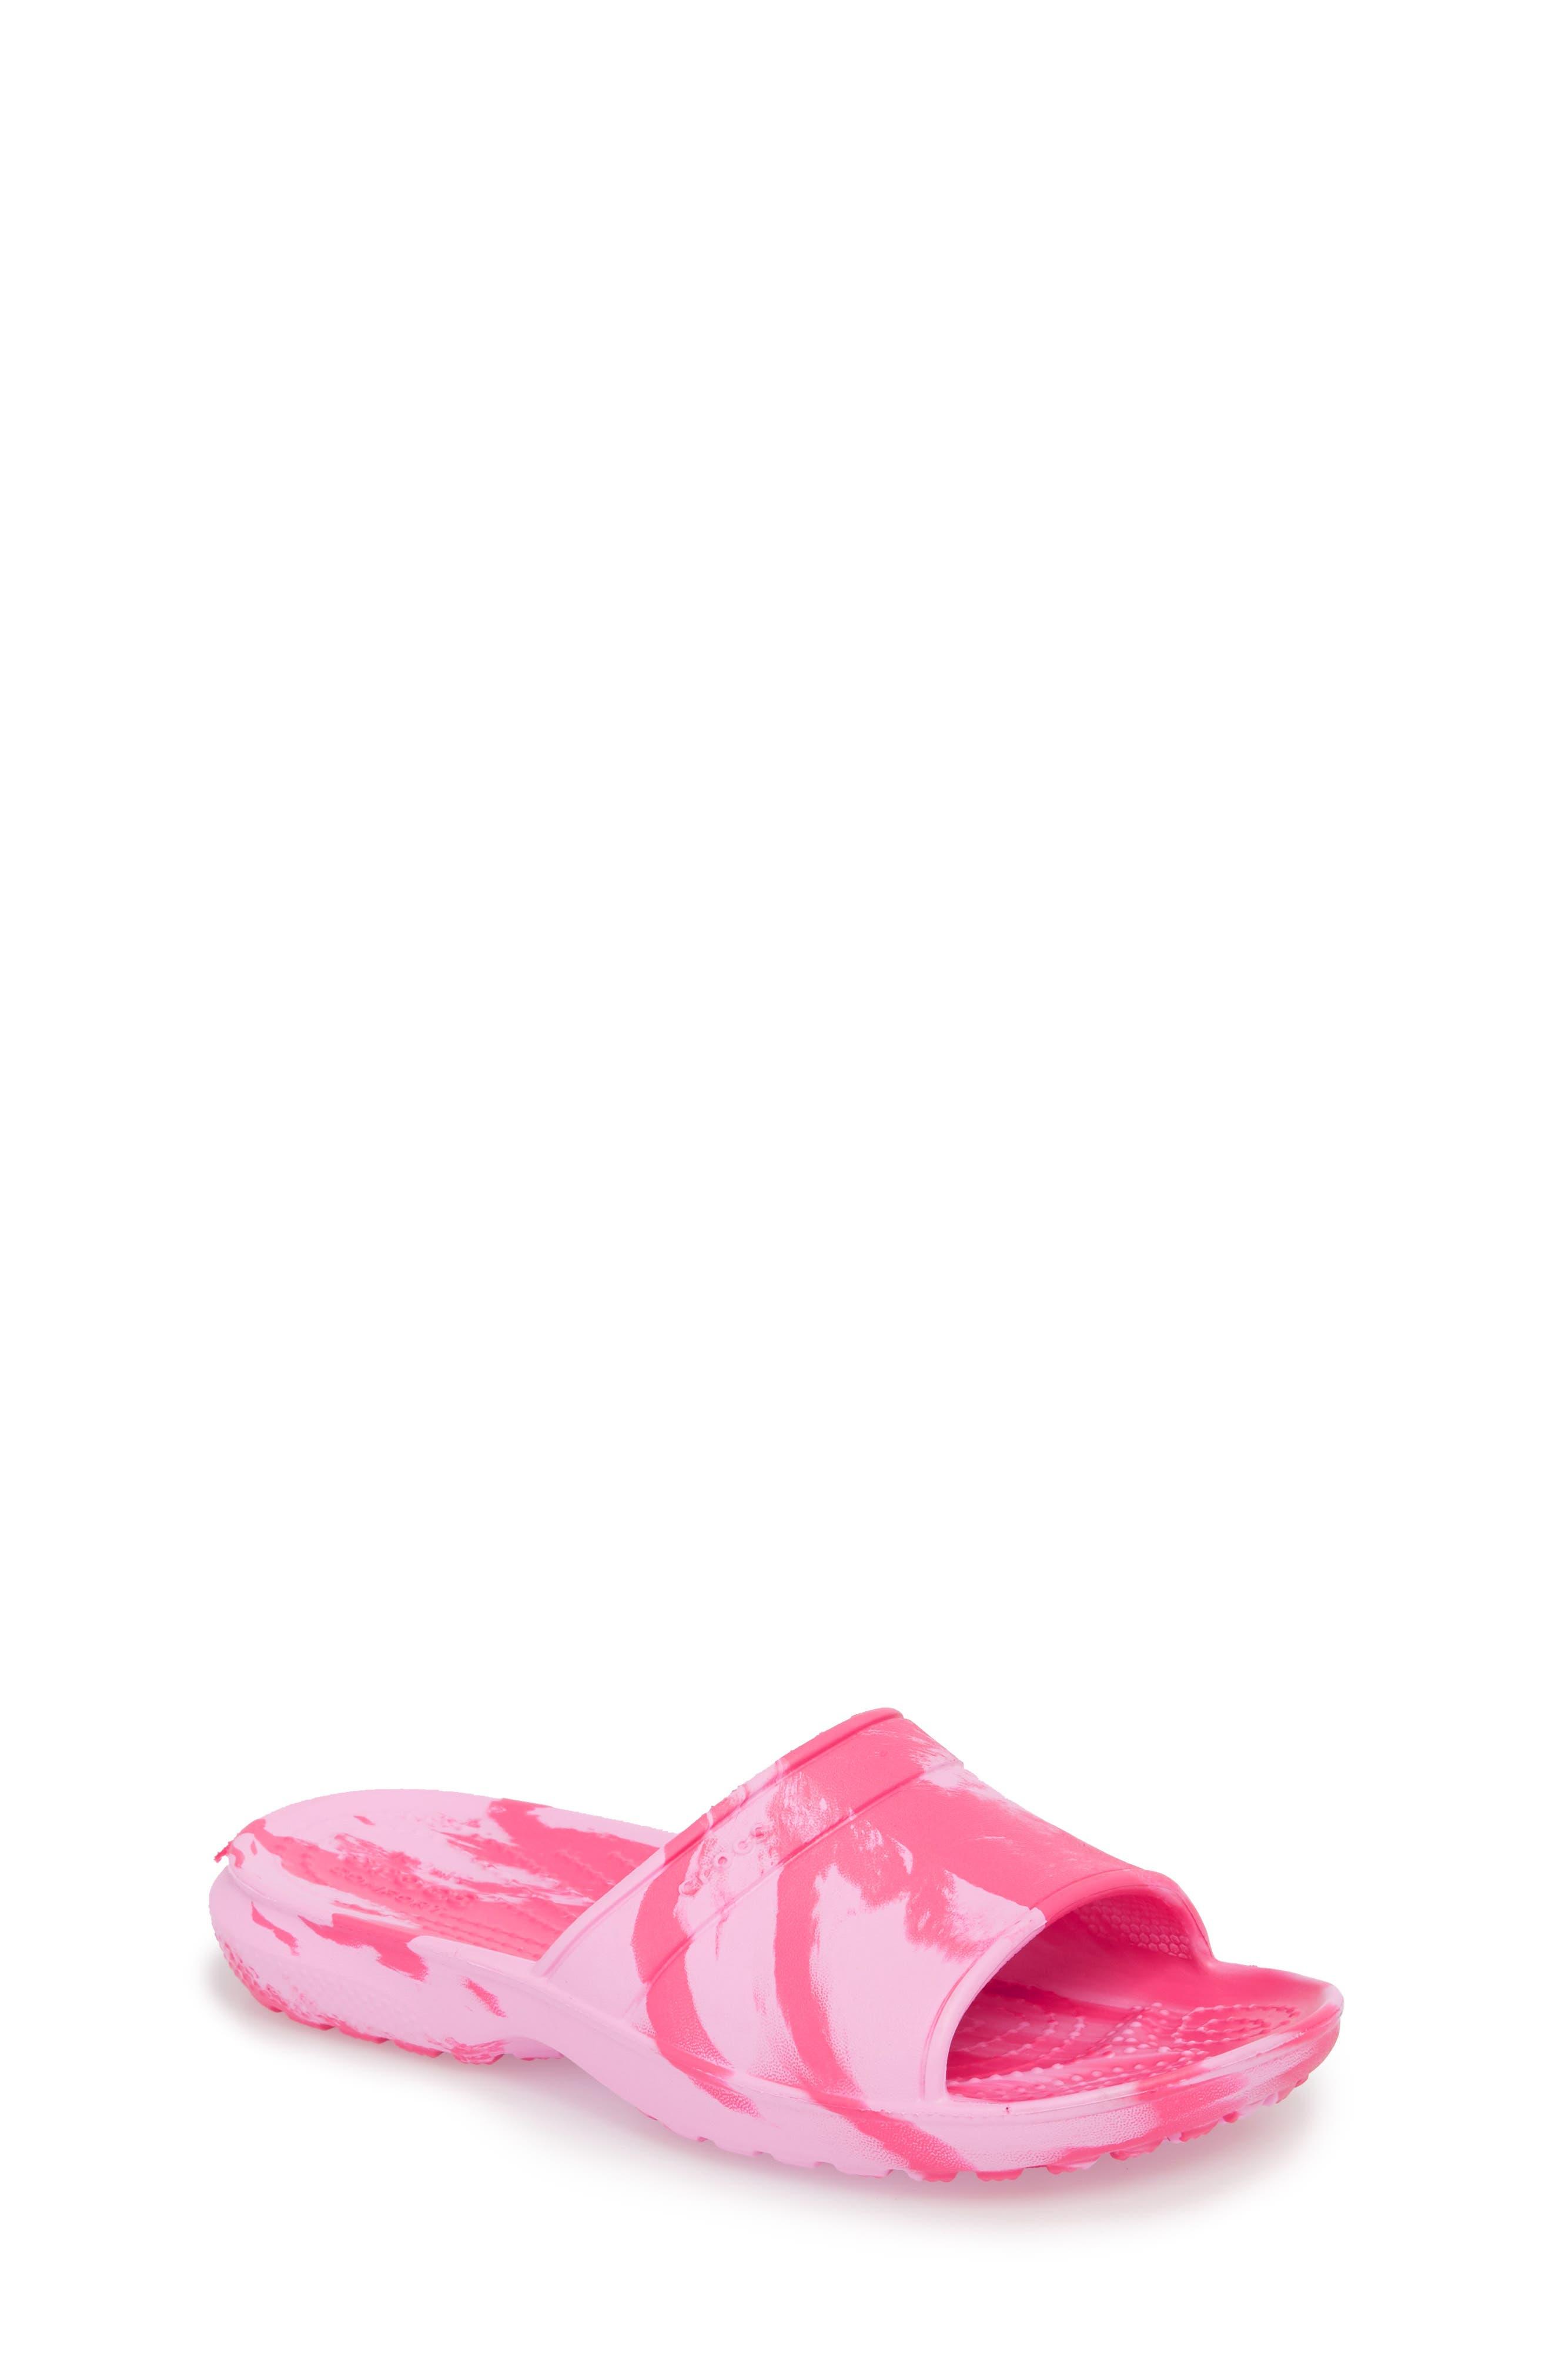 Classic Swirl Slide,                             Main thumbnail 1, color,                             Paradise Pink